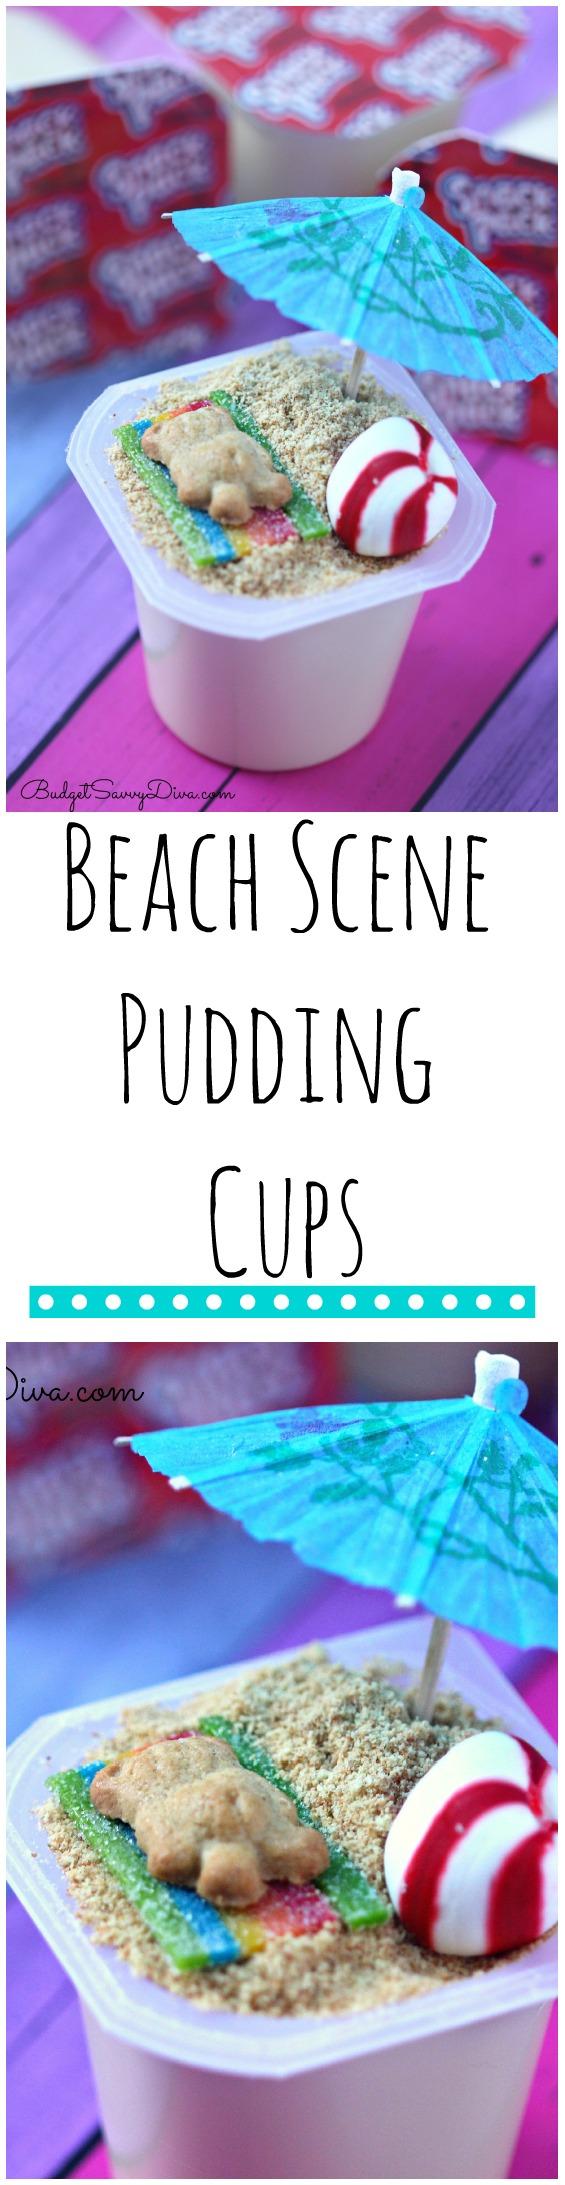 Beach Scene Pudding Cups